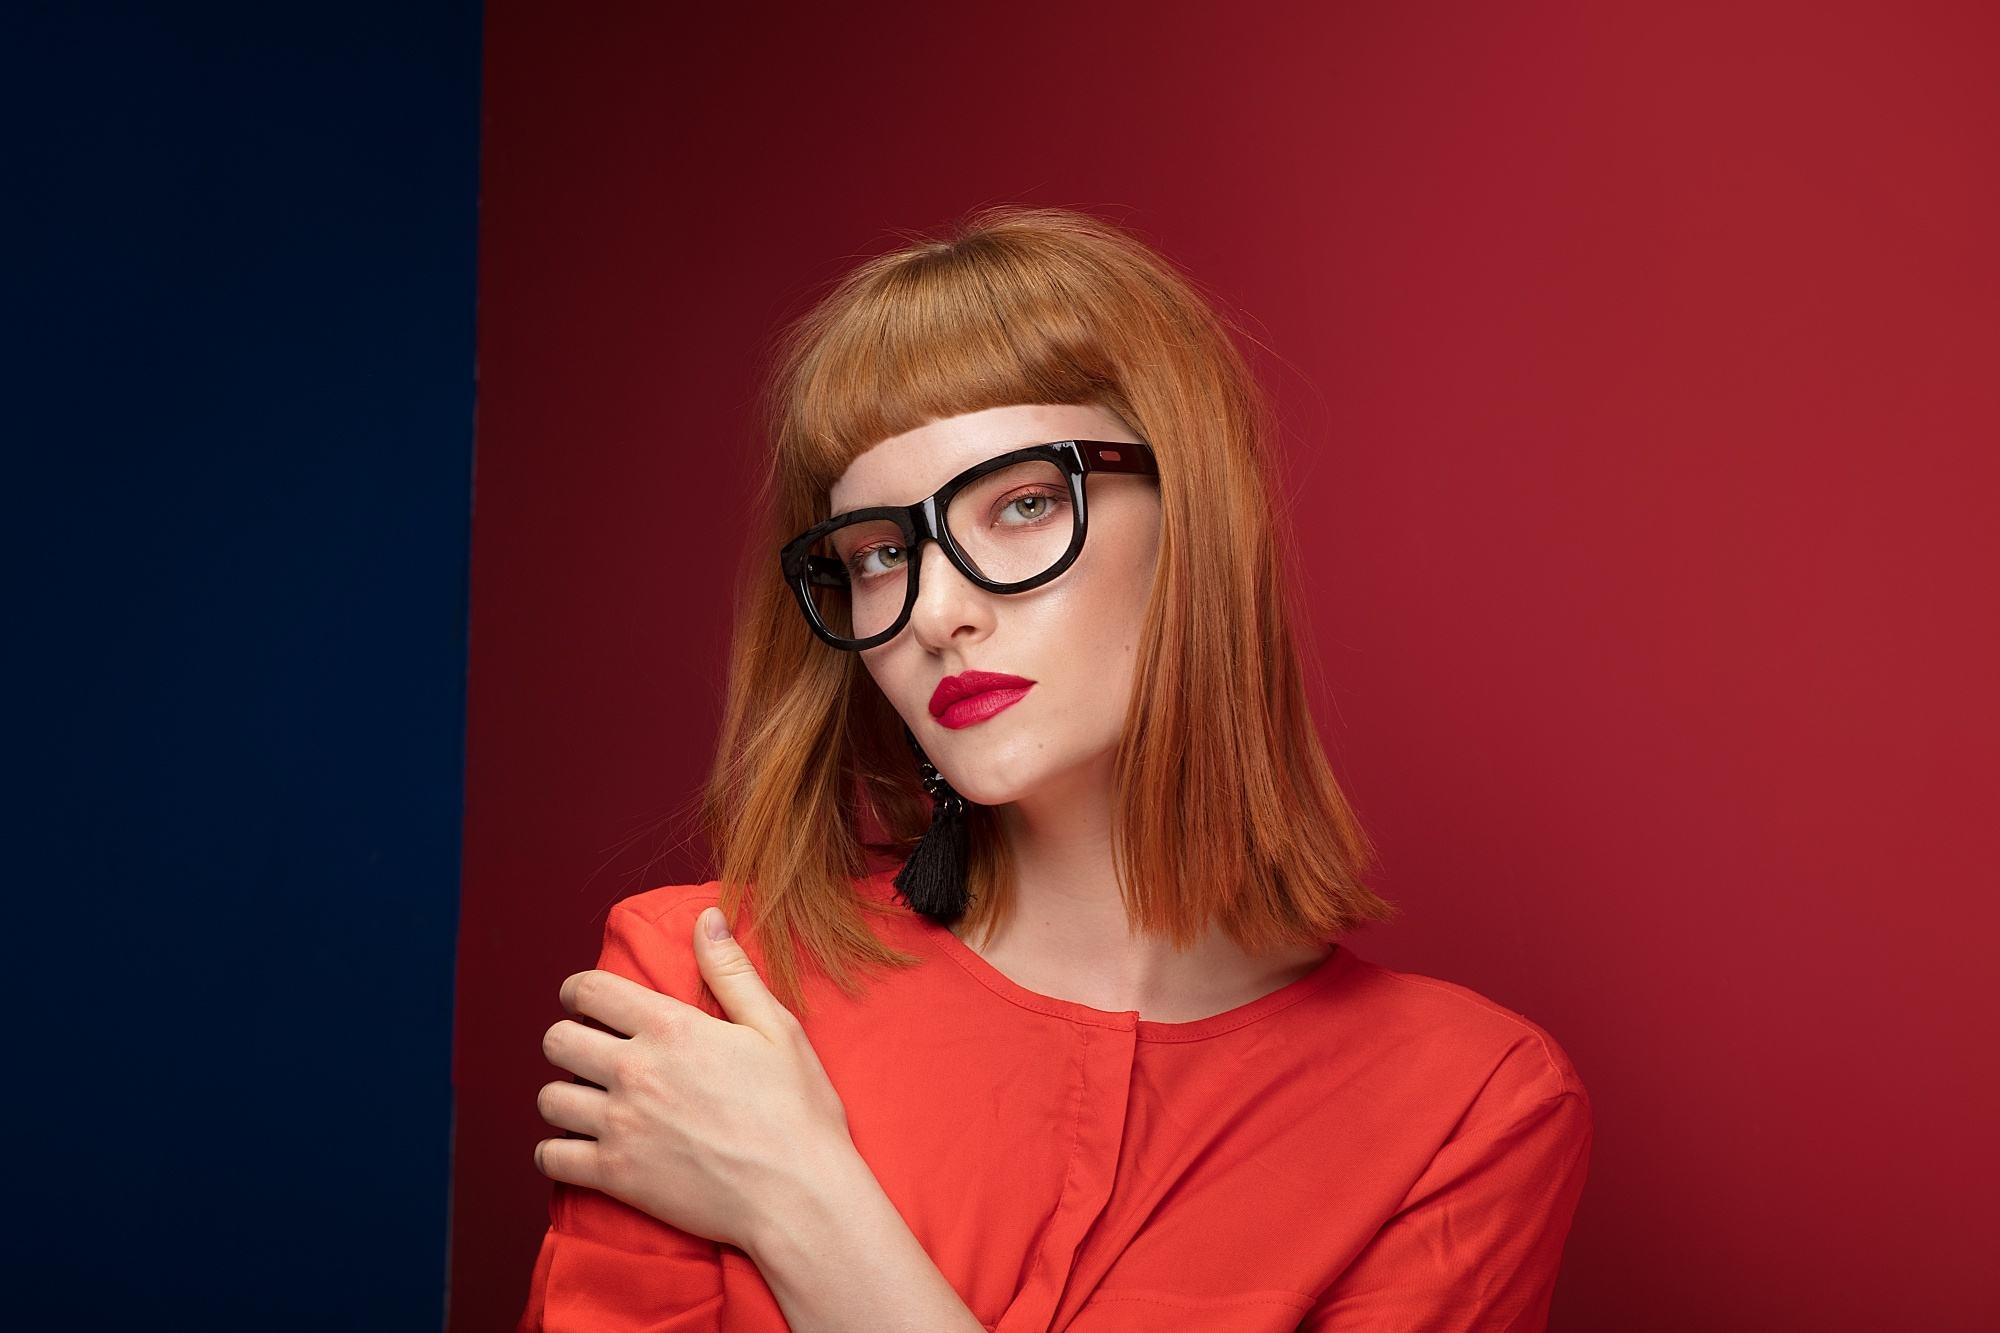 Baby bangs for short hair: Closeup shot of a woman with reddish lob with baby bangs wearing eyeglasses